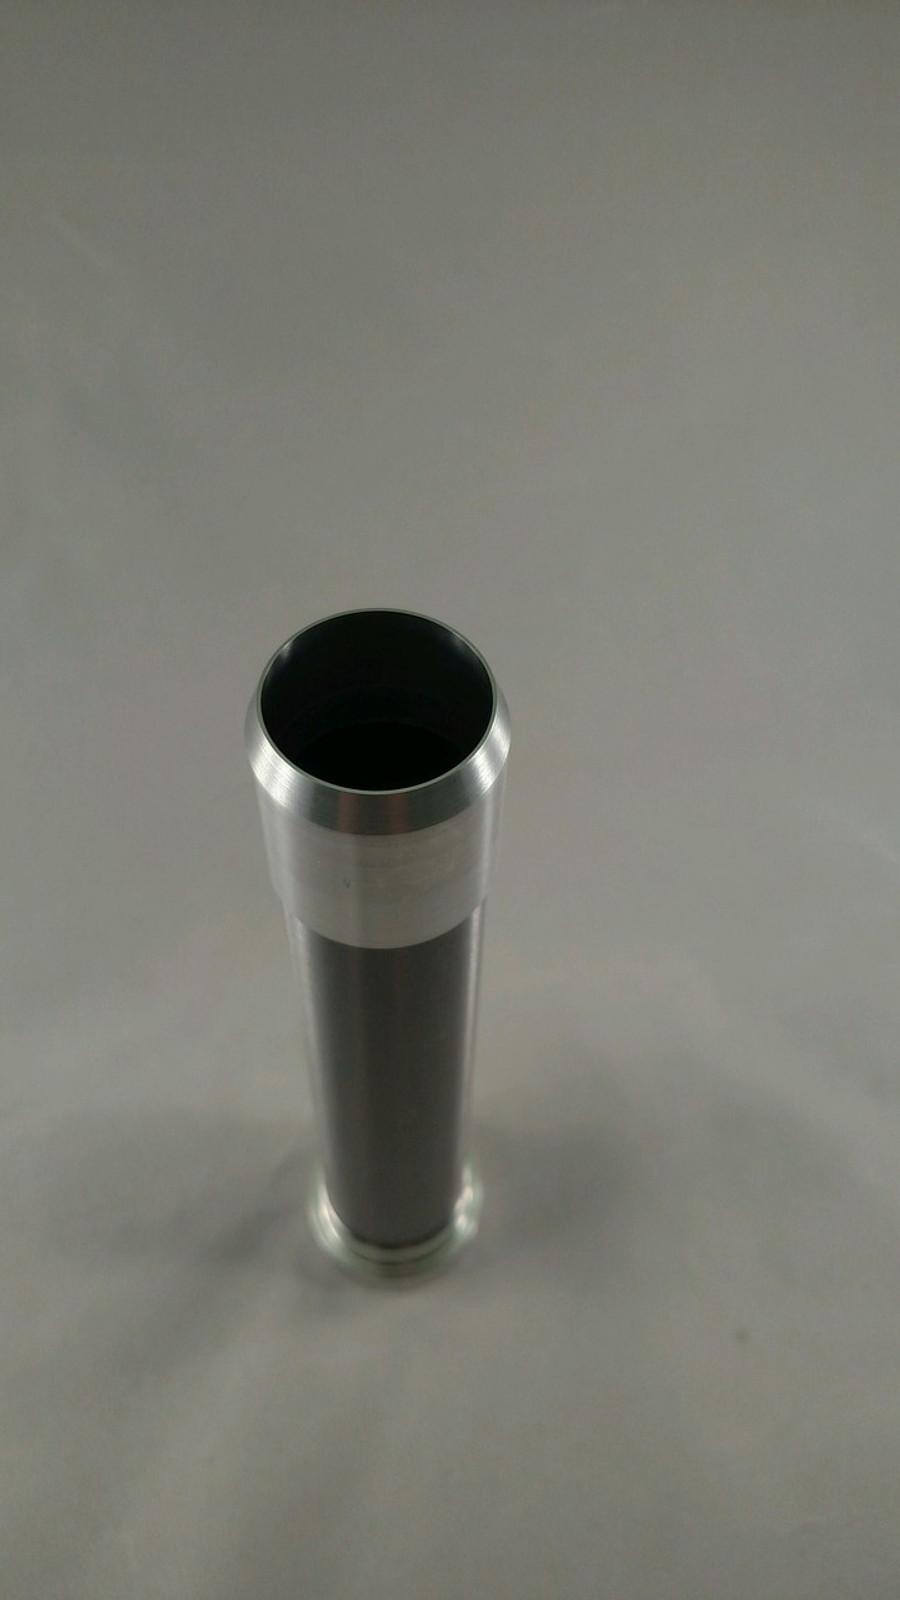 Spark Plug Tube - Noonan Racing Engineering Billet Valve Cover , Large Hole